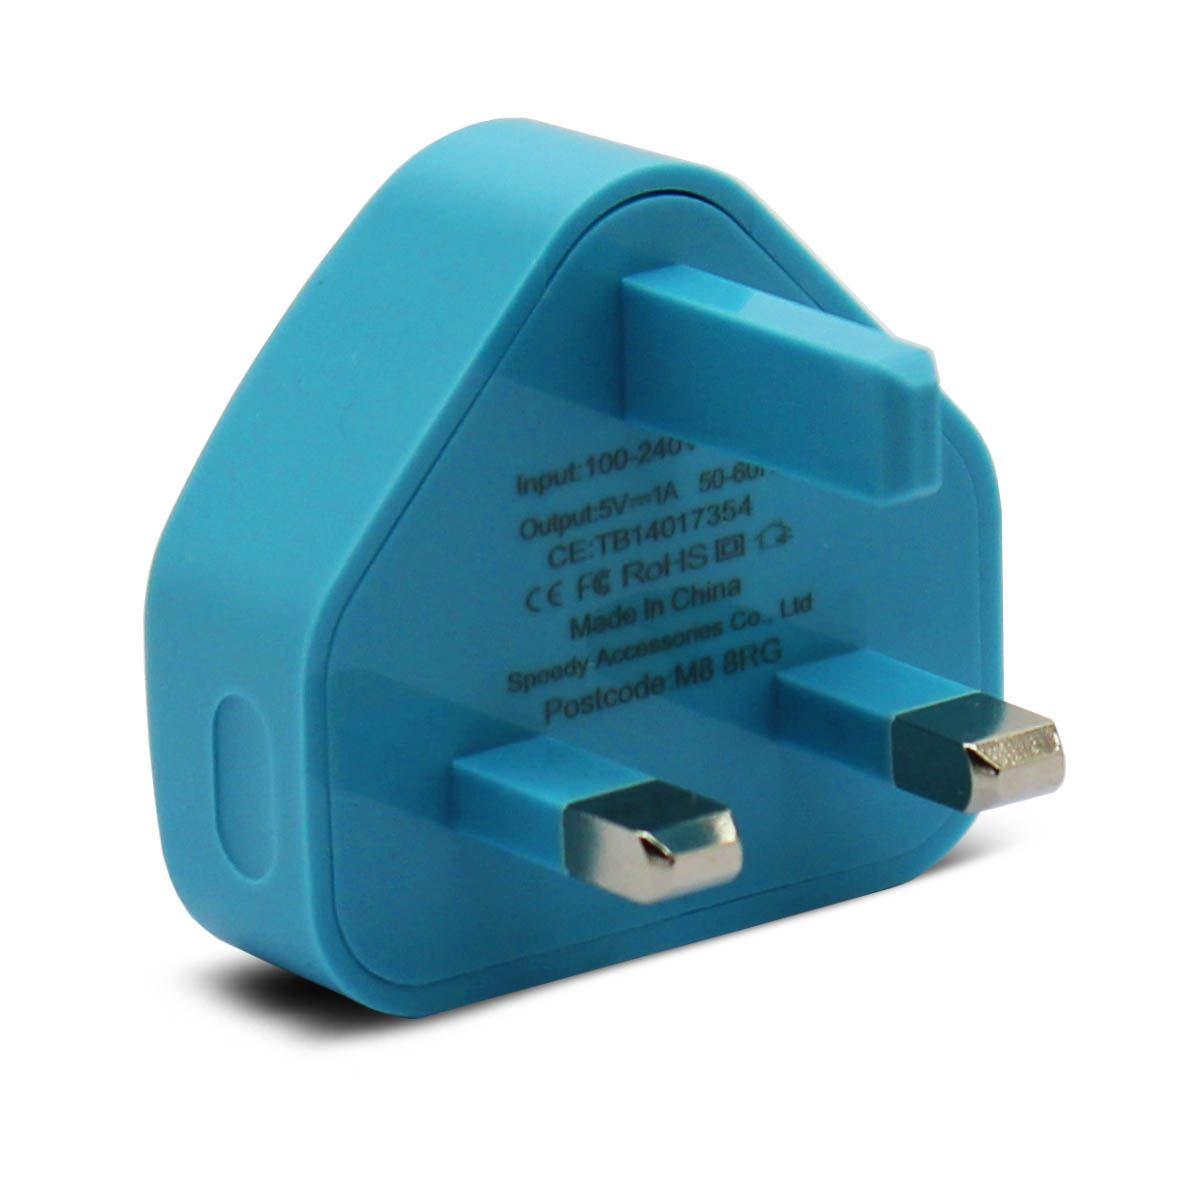 CE-UK-Mains-Wall-3-Pin-USB-Plug-Power-Adaptor-Charger-Samsung-Galaxy-J2-J3-J5-J7